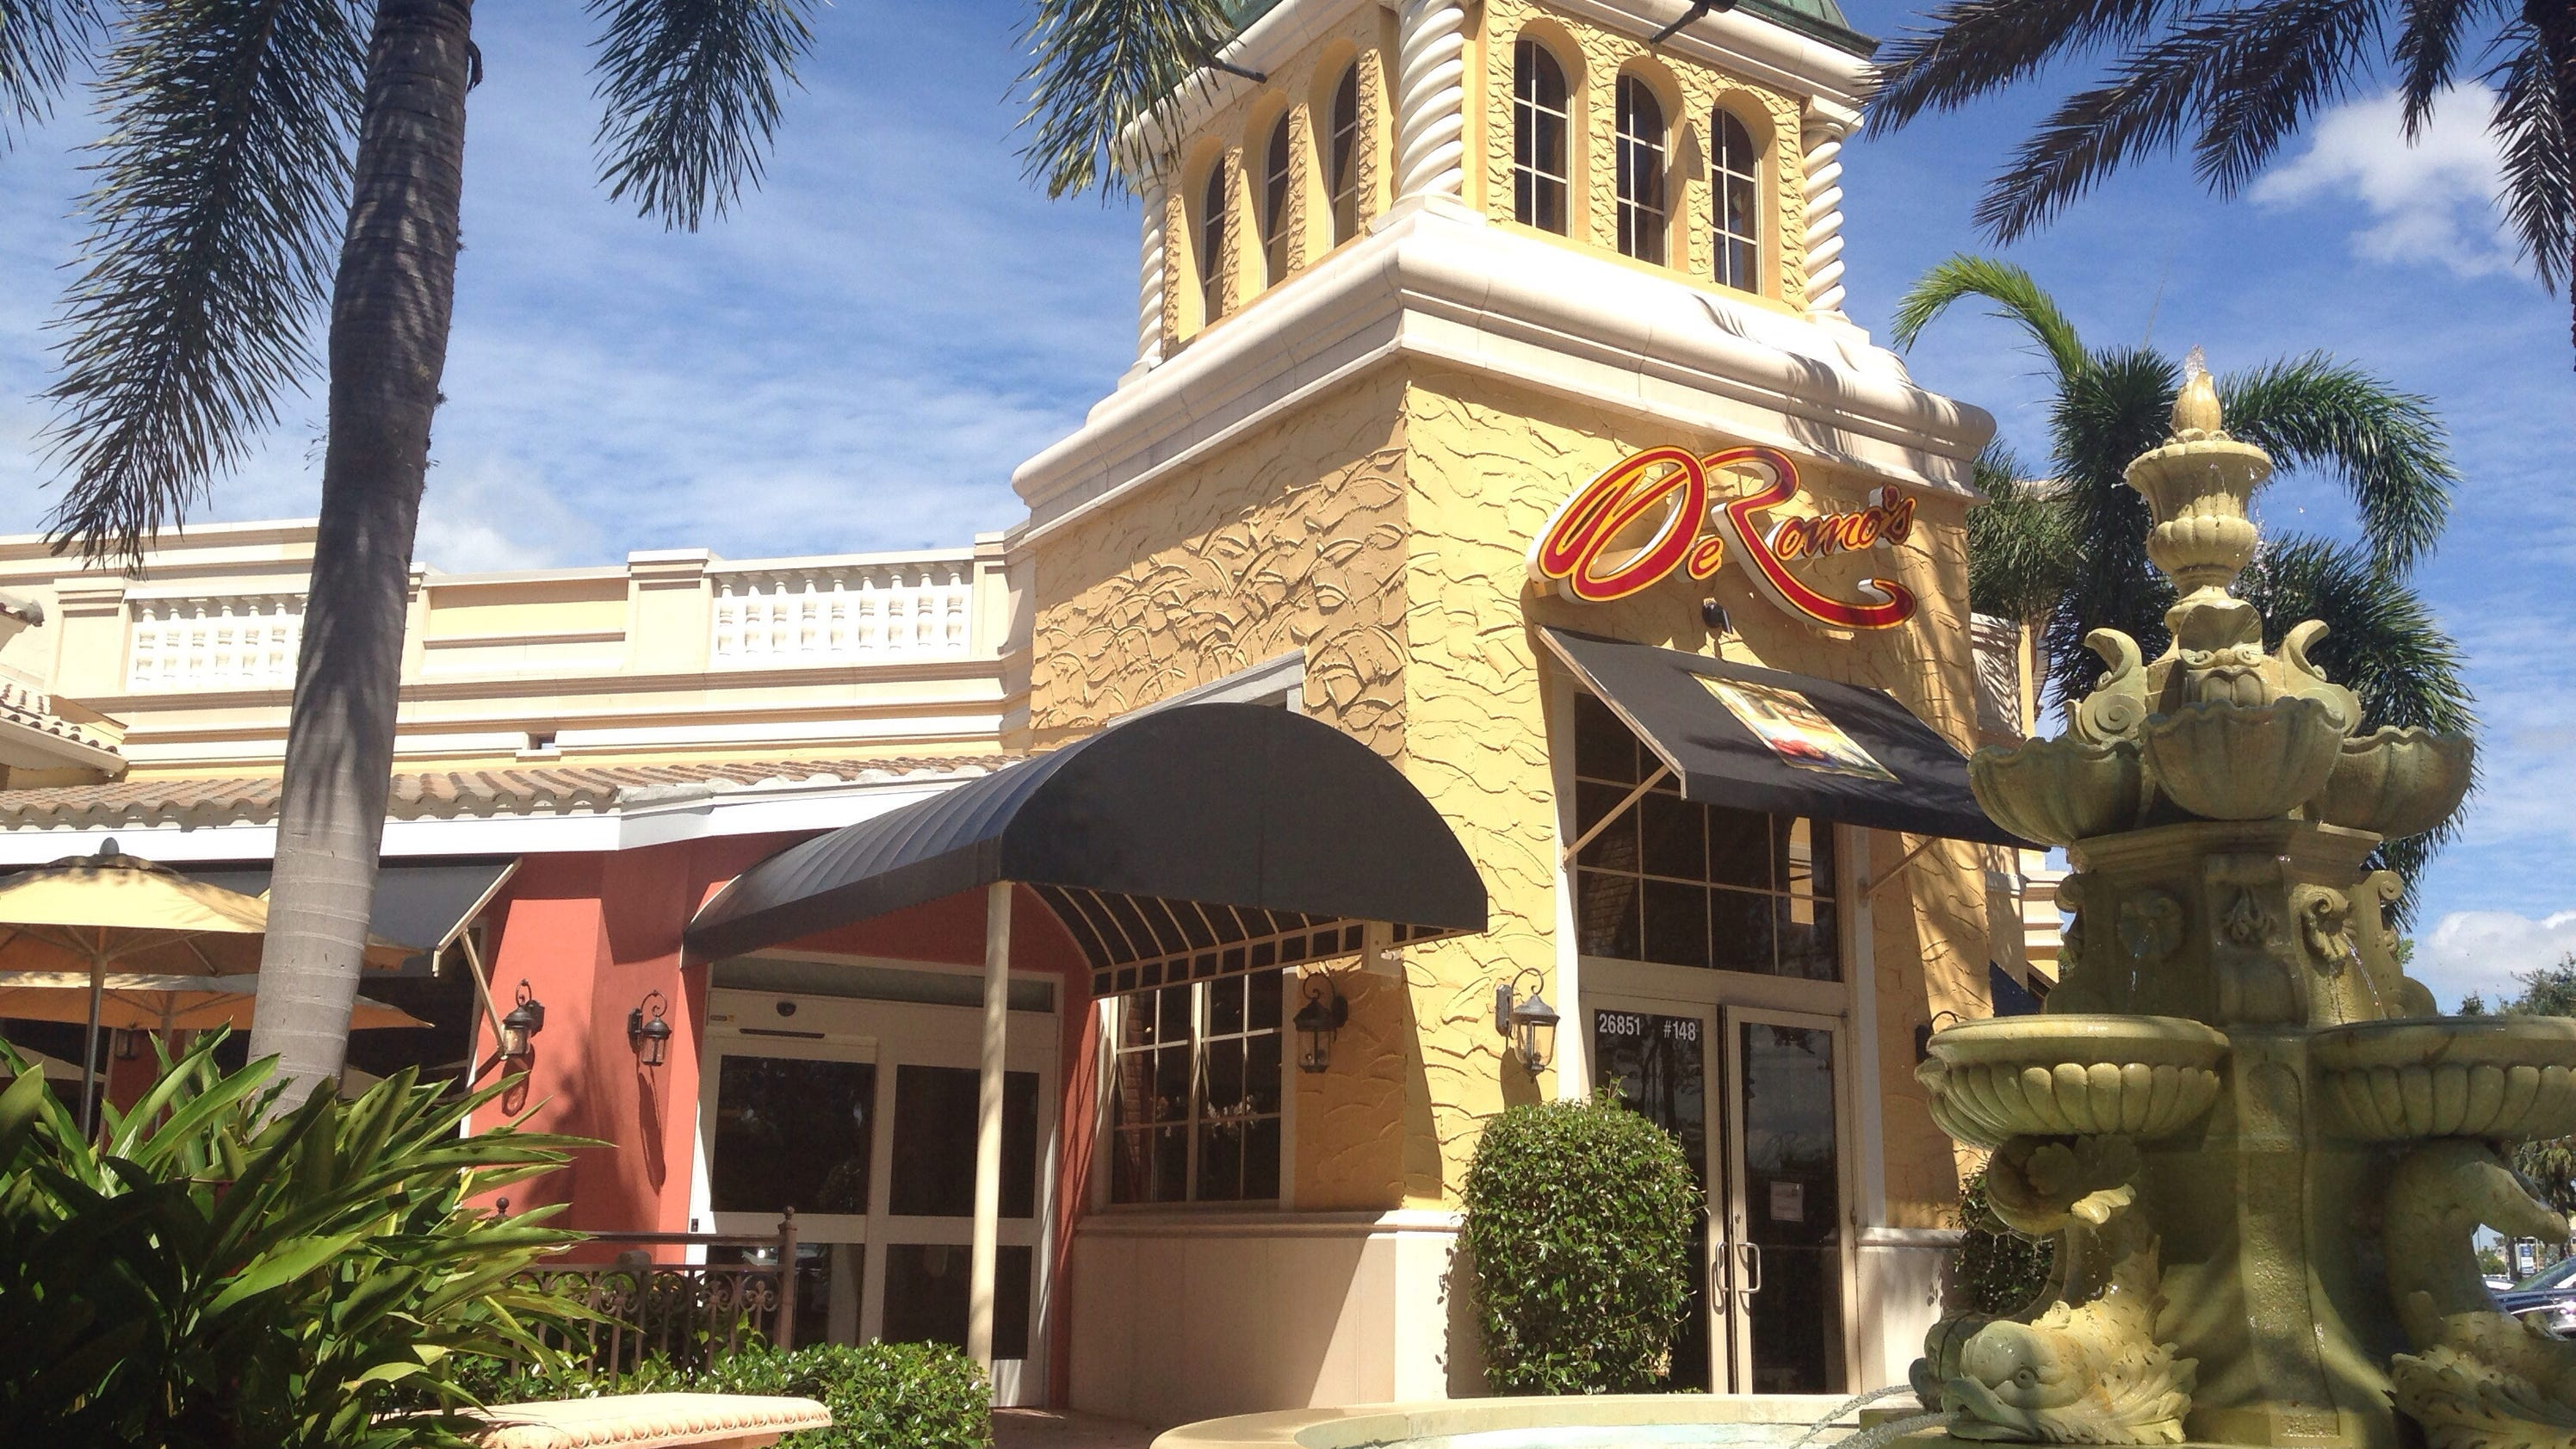 New swfl restaurants debut more on horizon for Global motors fort myers florida